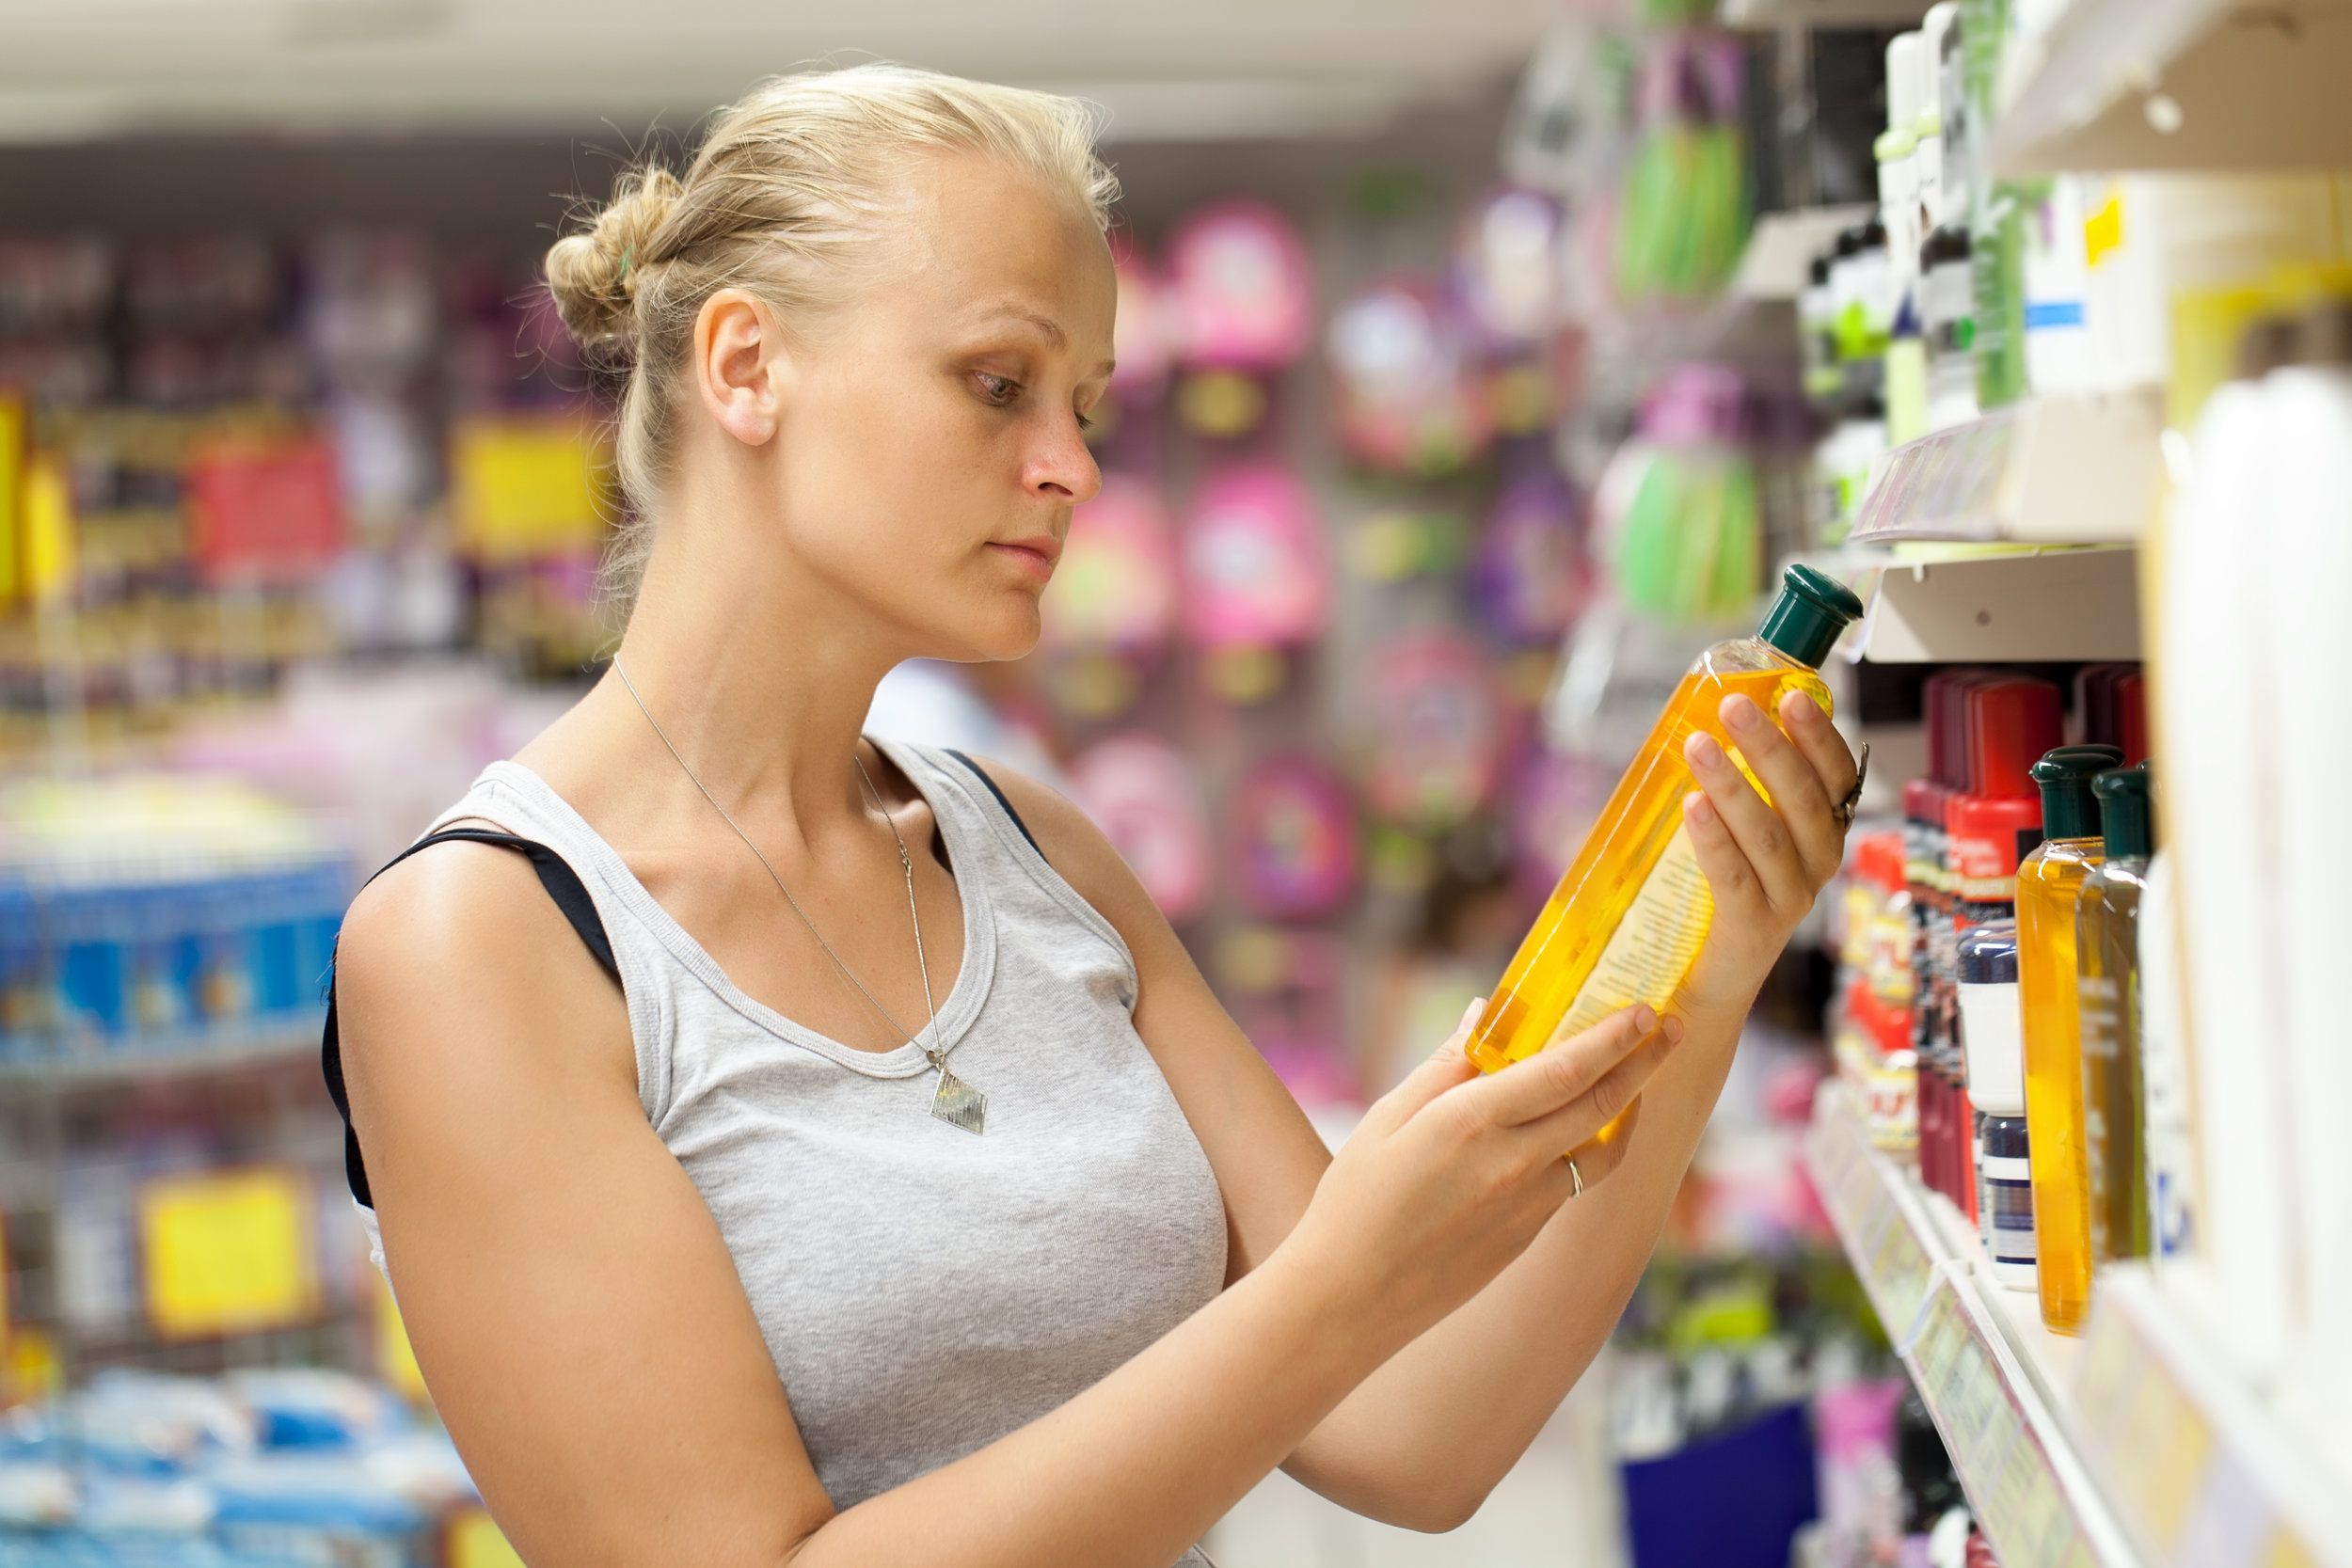 why-conserve-girl-plastic-microbeads-shampoo.jpg